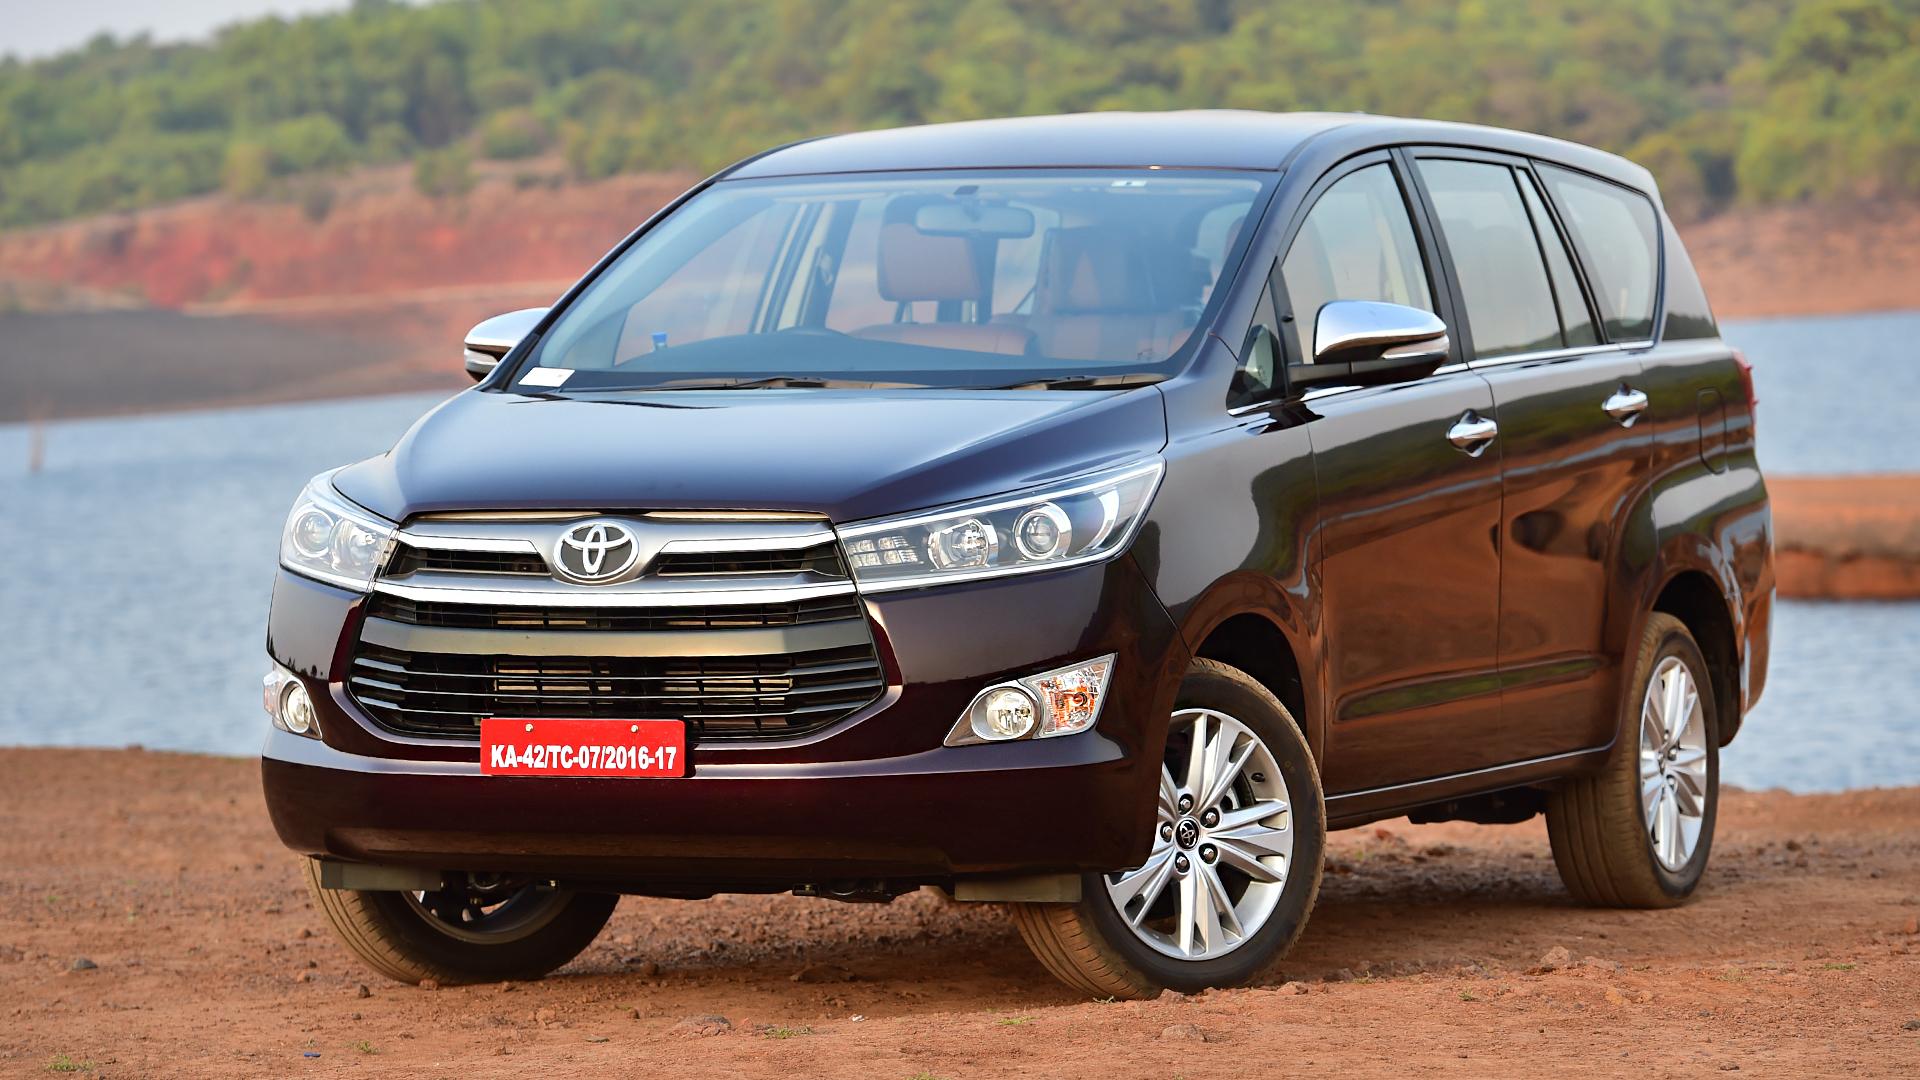 Toyota Innova Crysta 2016 STD